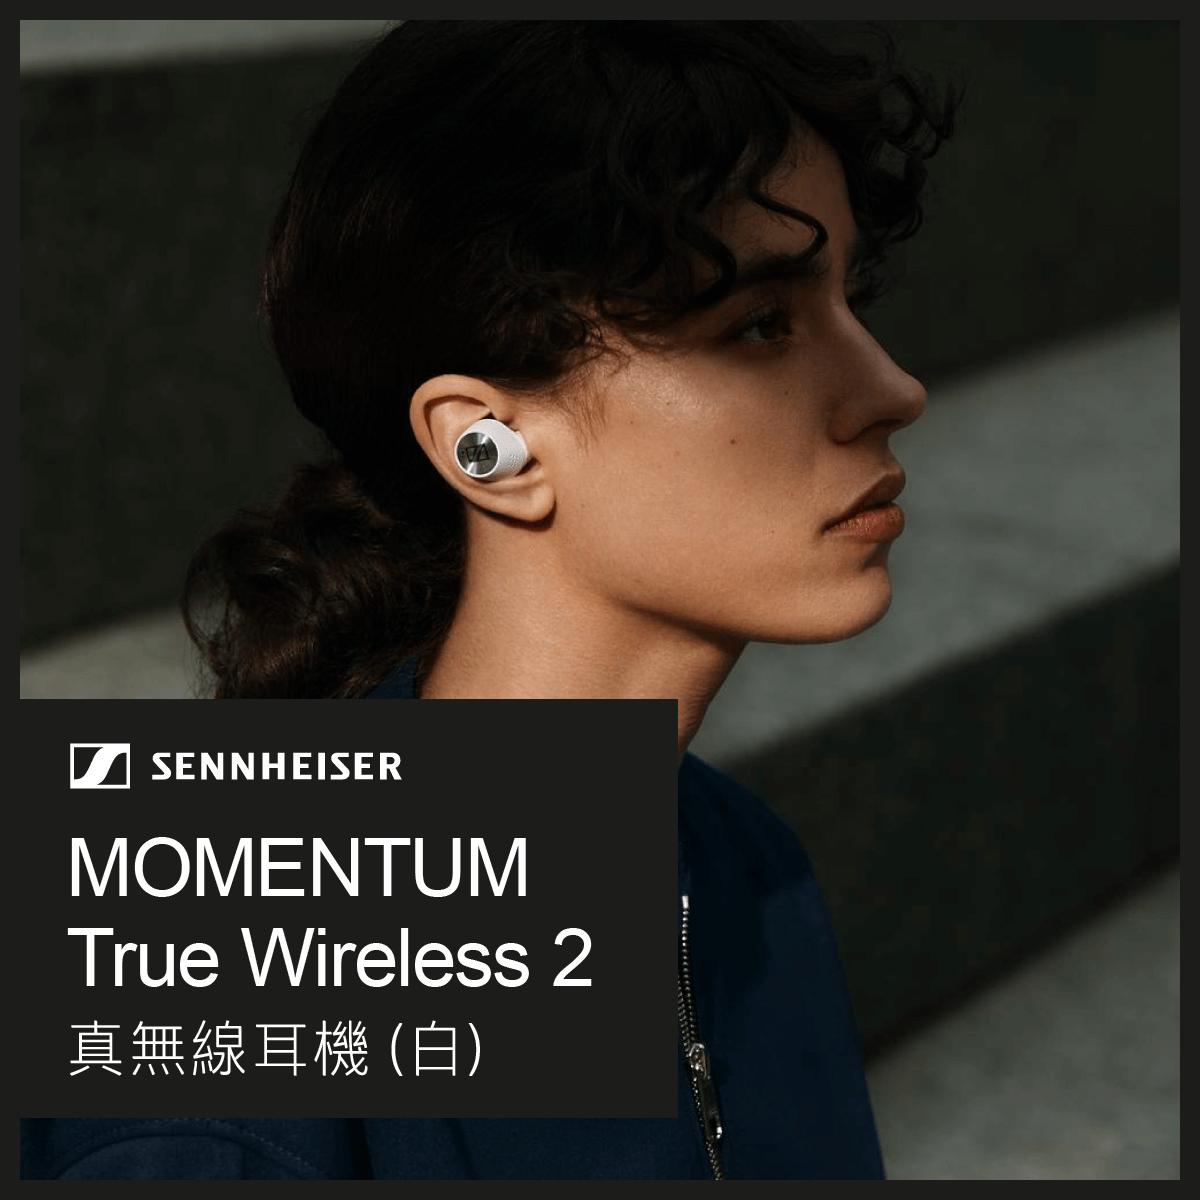 Sennheiser MOMENTUM True Wireless 2 (White)